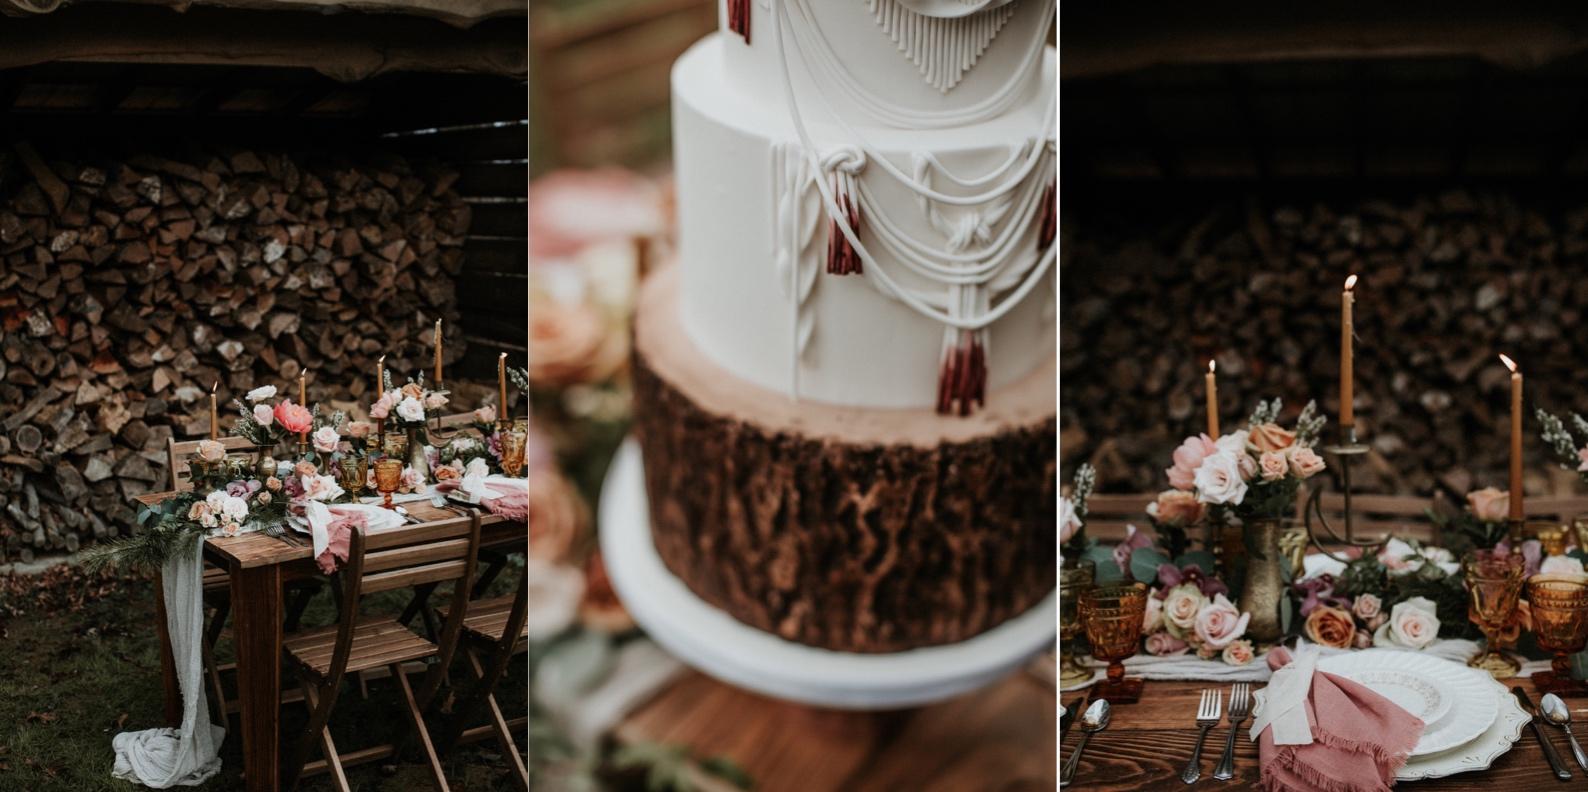 03_Bohoshoot_wowfactorcakes_woodsyelopement.jpg